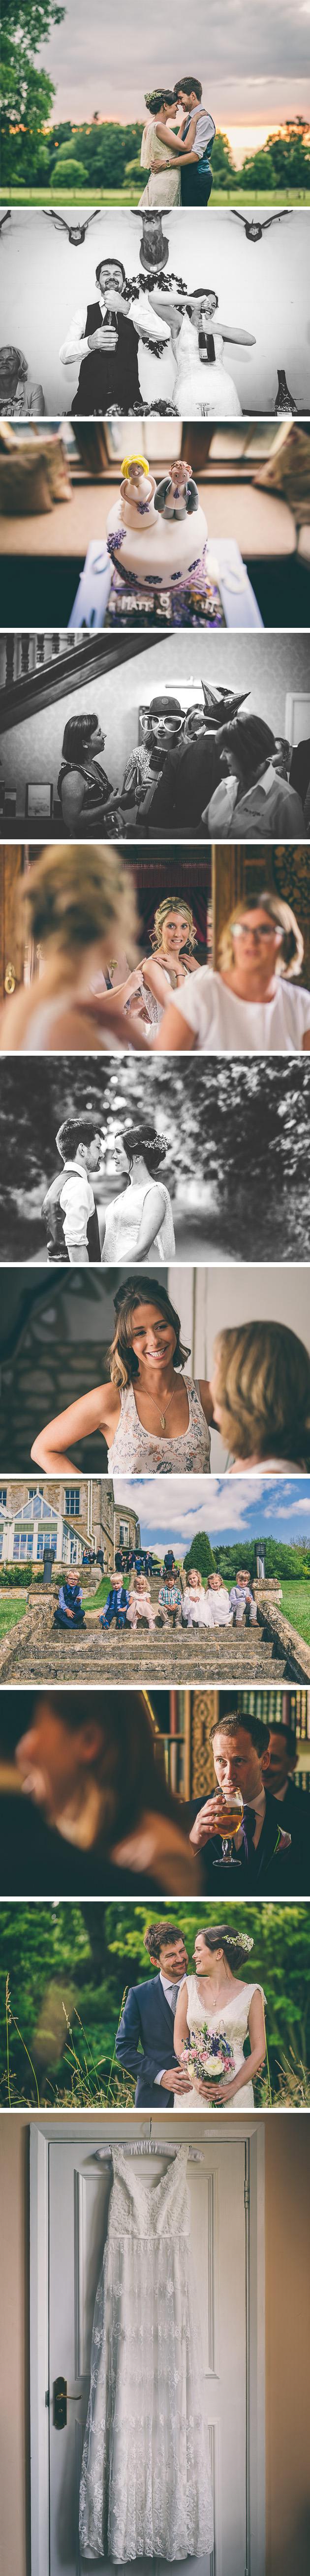 Bridesmaid talking to bride during prep